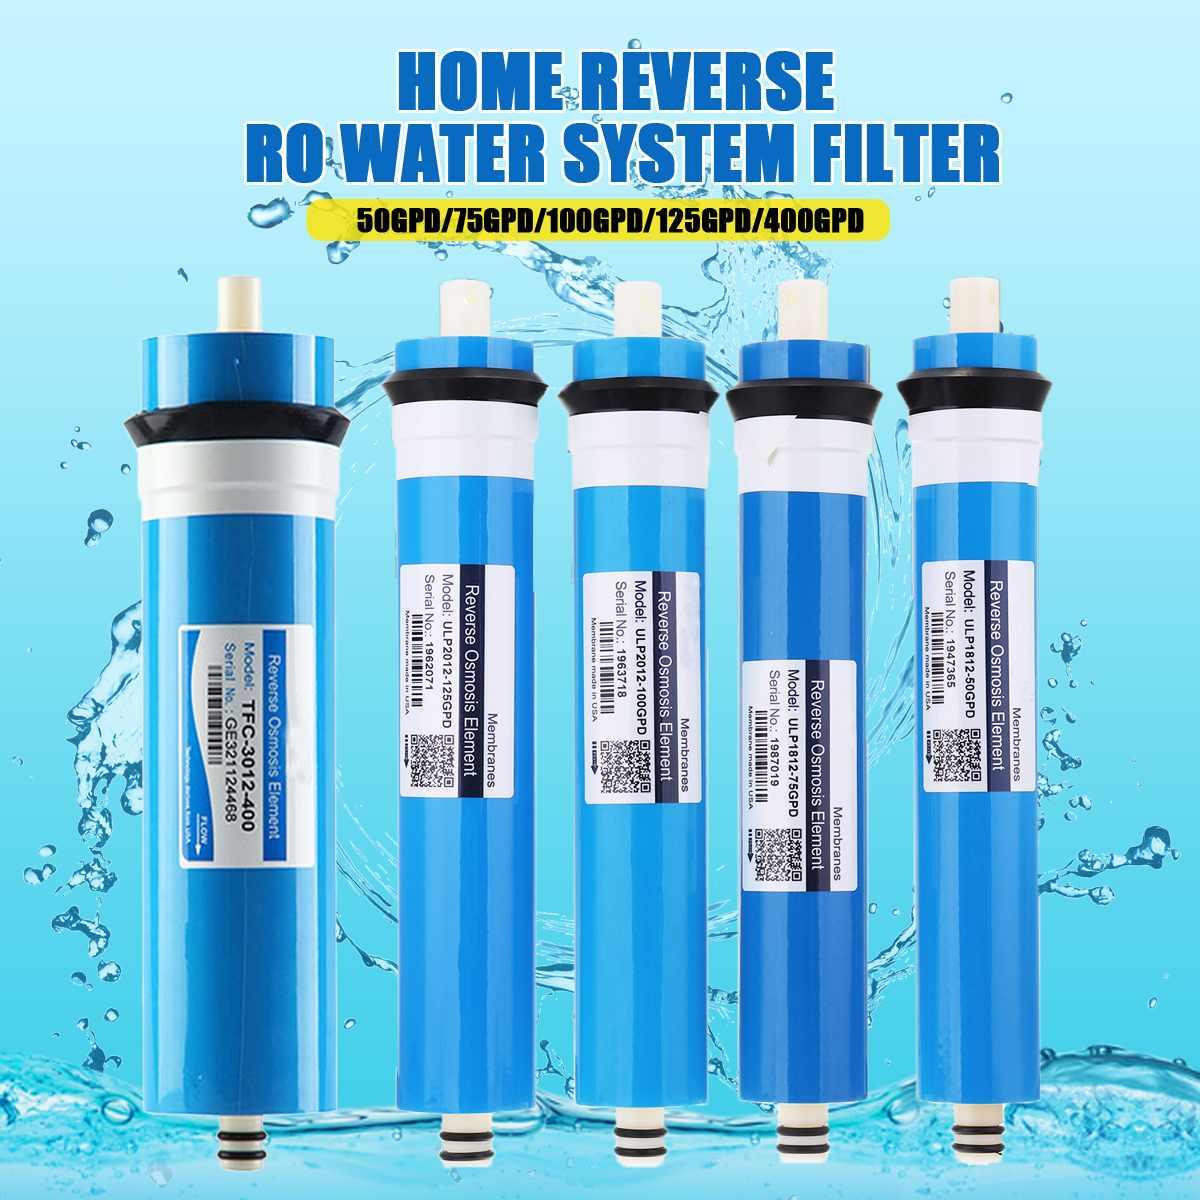 ro Membrane Buy One Give One Generic 50 Gpd Reverse Osmosis Membrane Aquarium Ro Filtration Water Filter Blue Reverse Osmosis